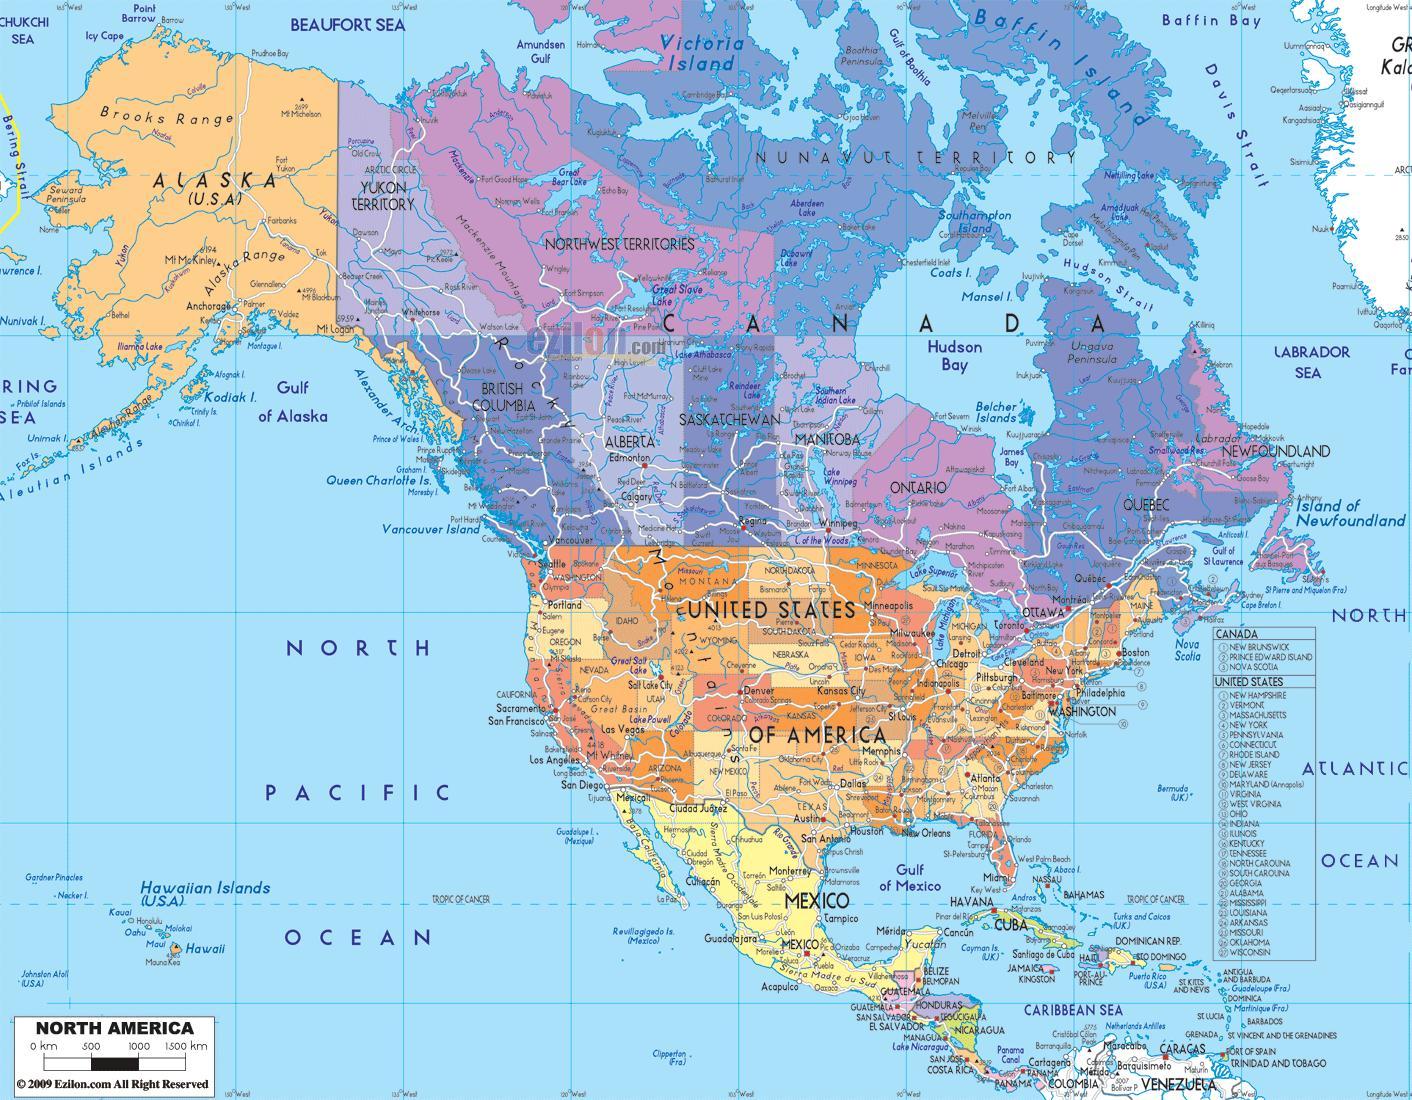 kart over canada Vis kart over Canada   Klart kart over Canada (Nord Amerika   Amerika) kart over canada